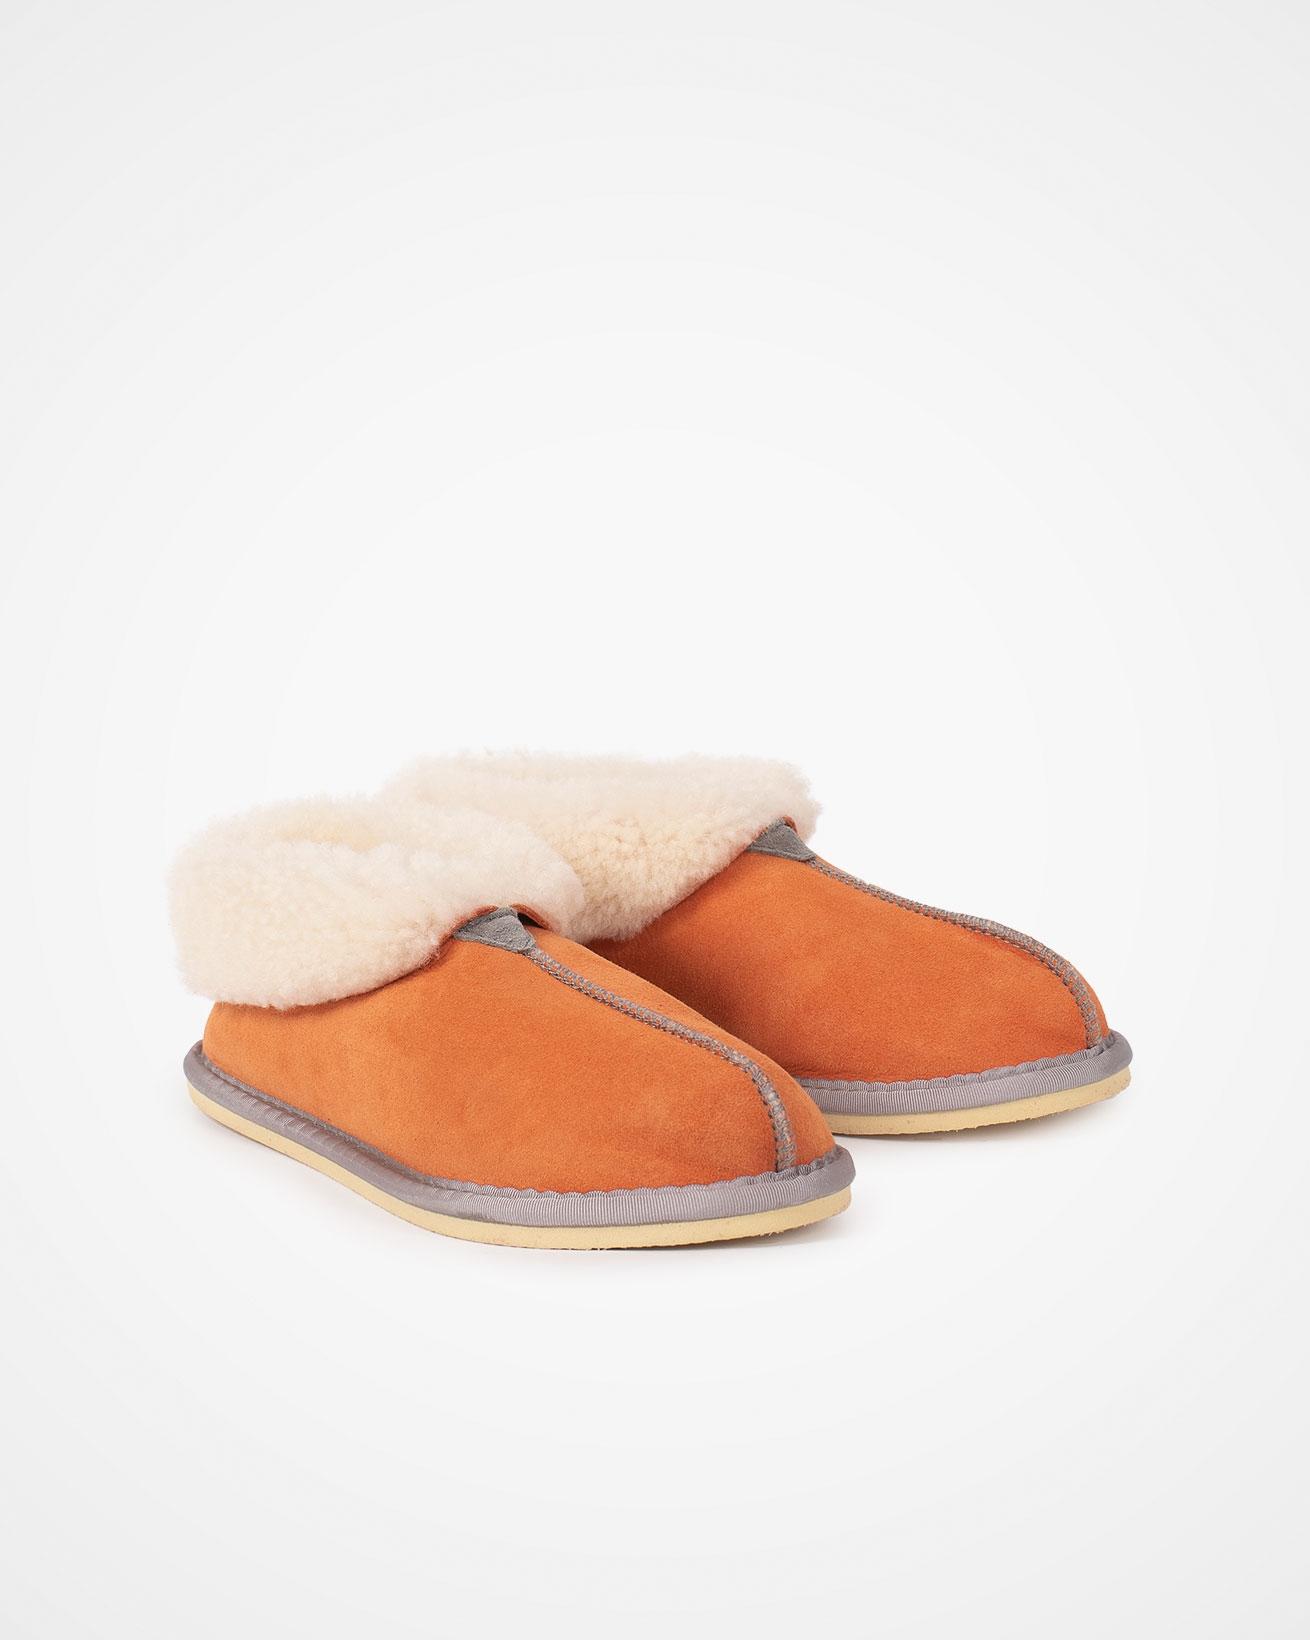 Ladies Sheepskin Bootee Slipper - Tobasco - Size 5 - 2488